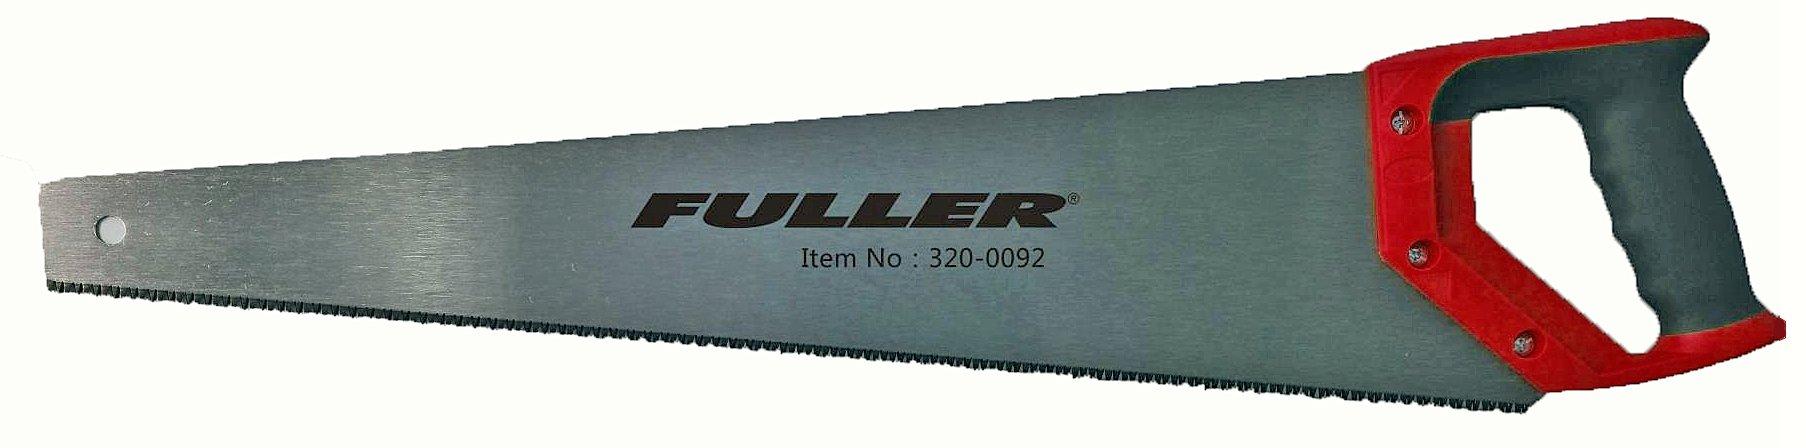 Fuller Tool 320-0092 22'' Handsaw 8TPI